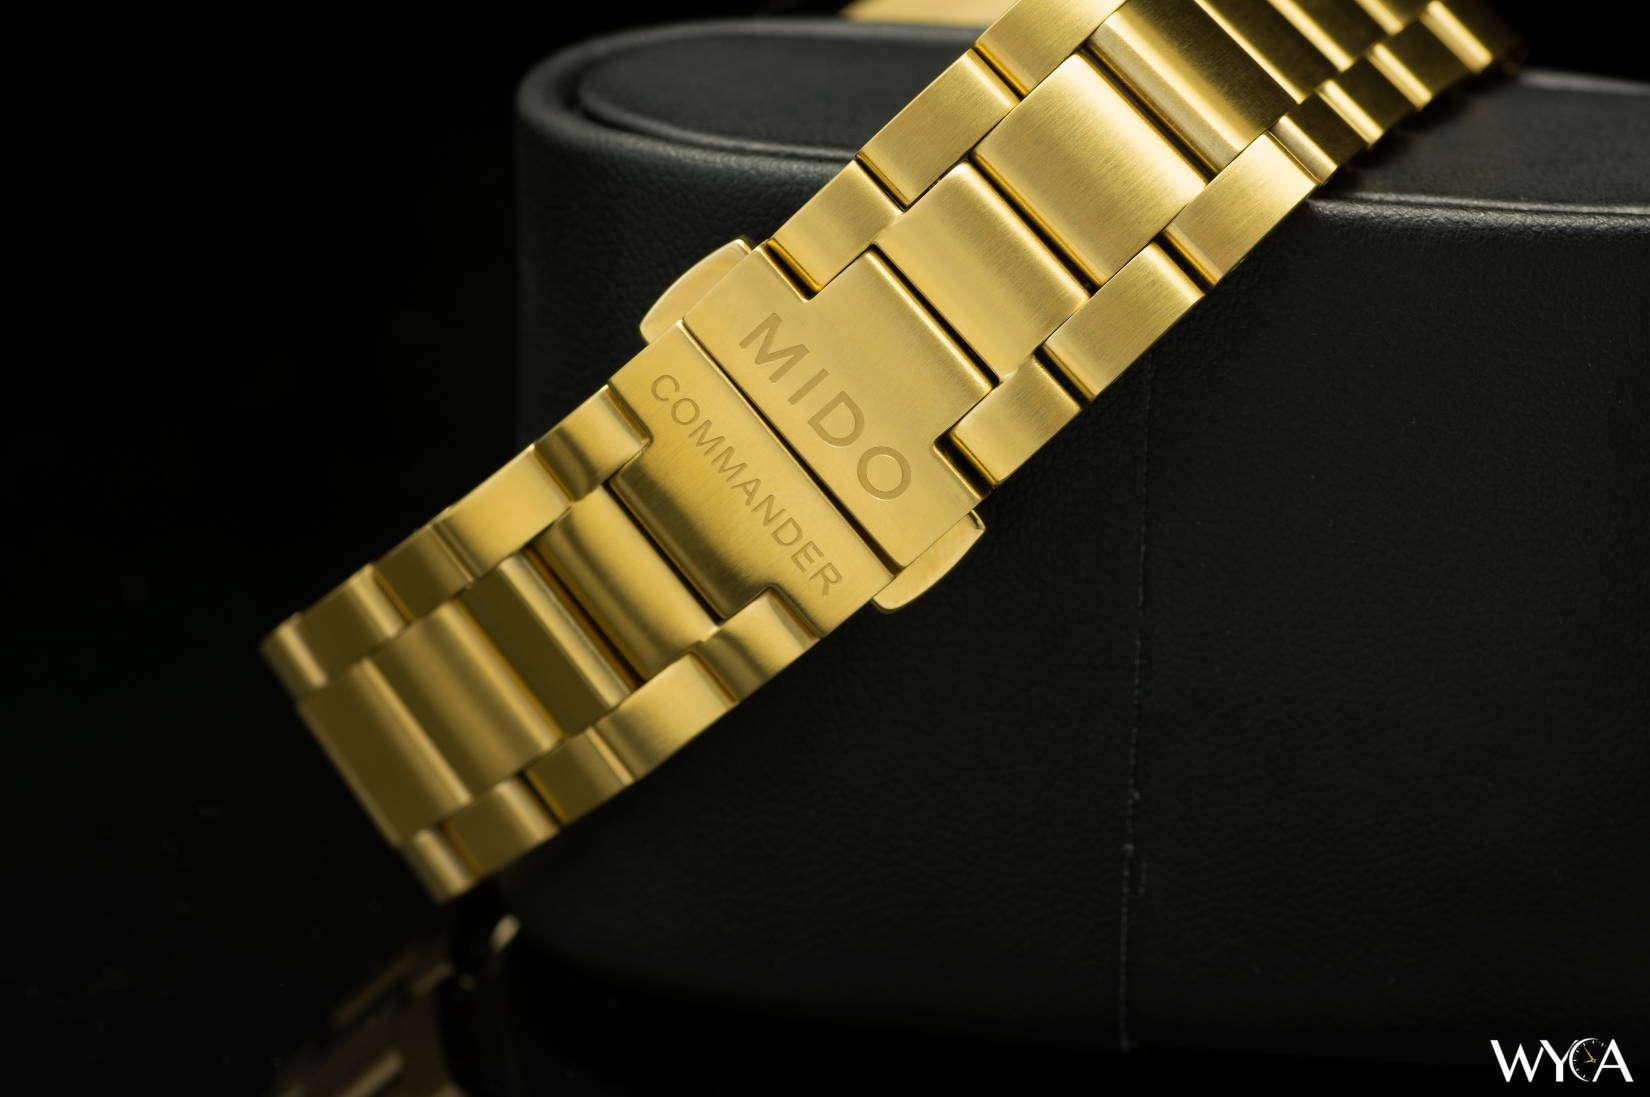 Mido Commander II Datoday Bracelet